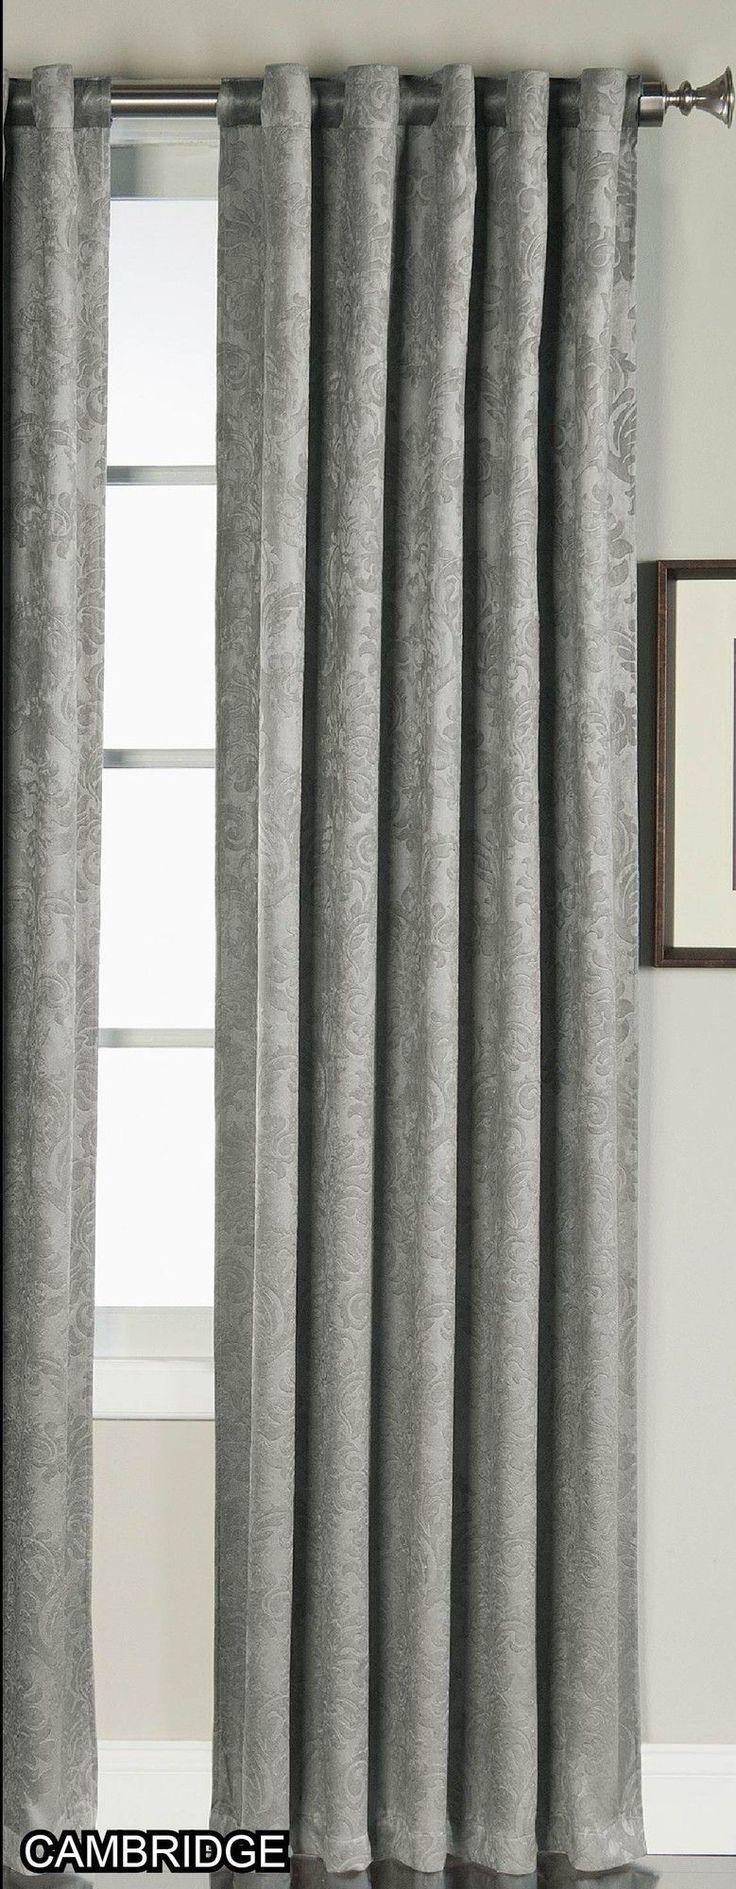 Johnson City Curtain Panels